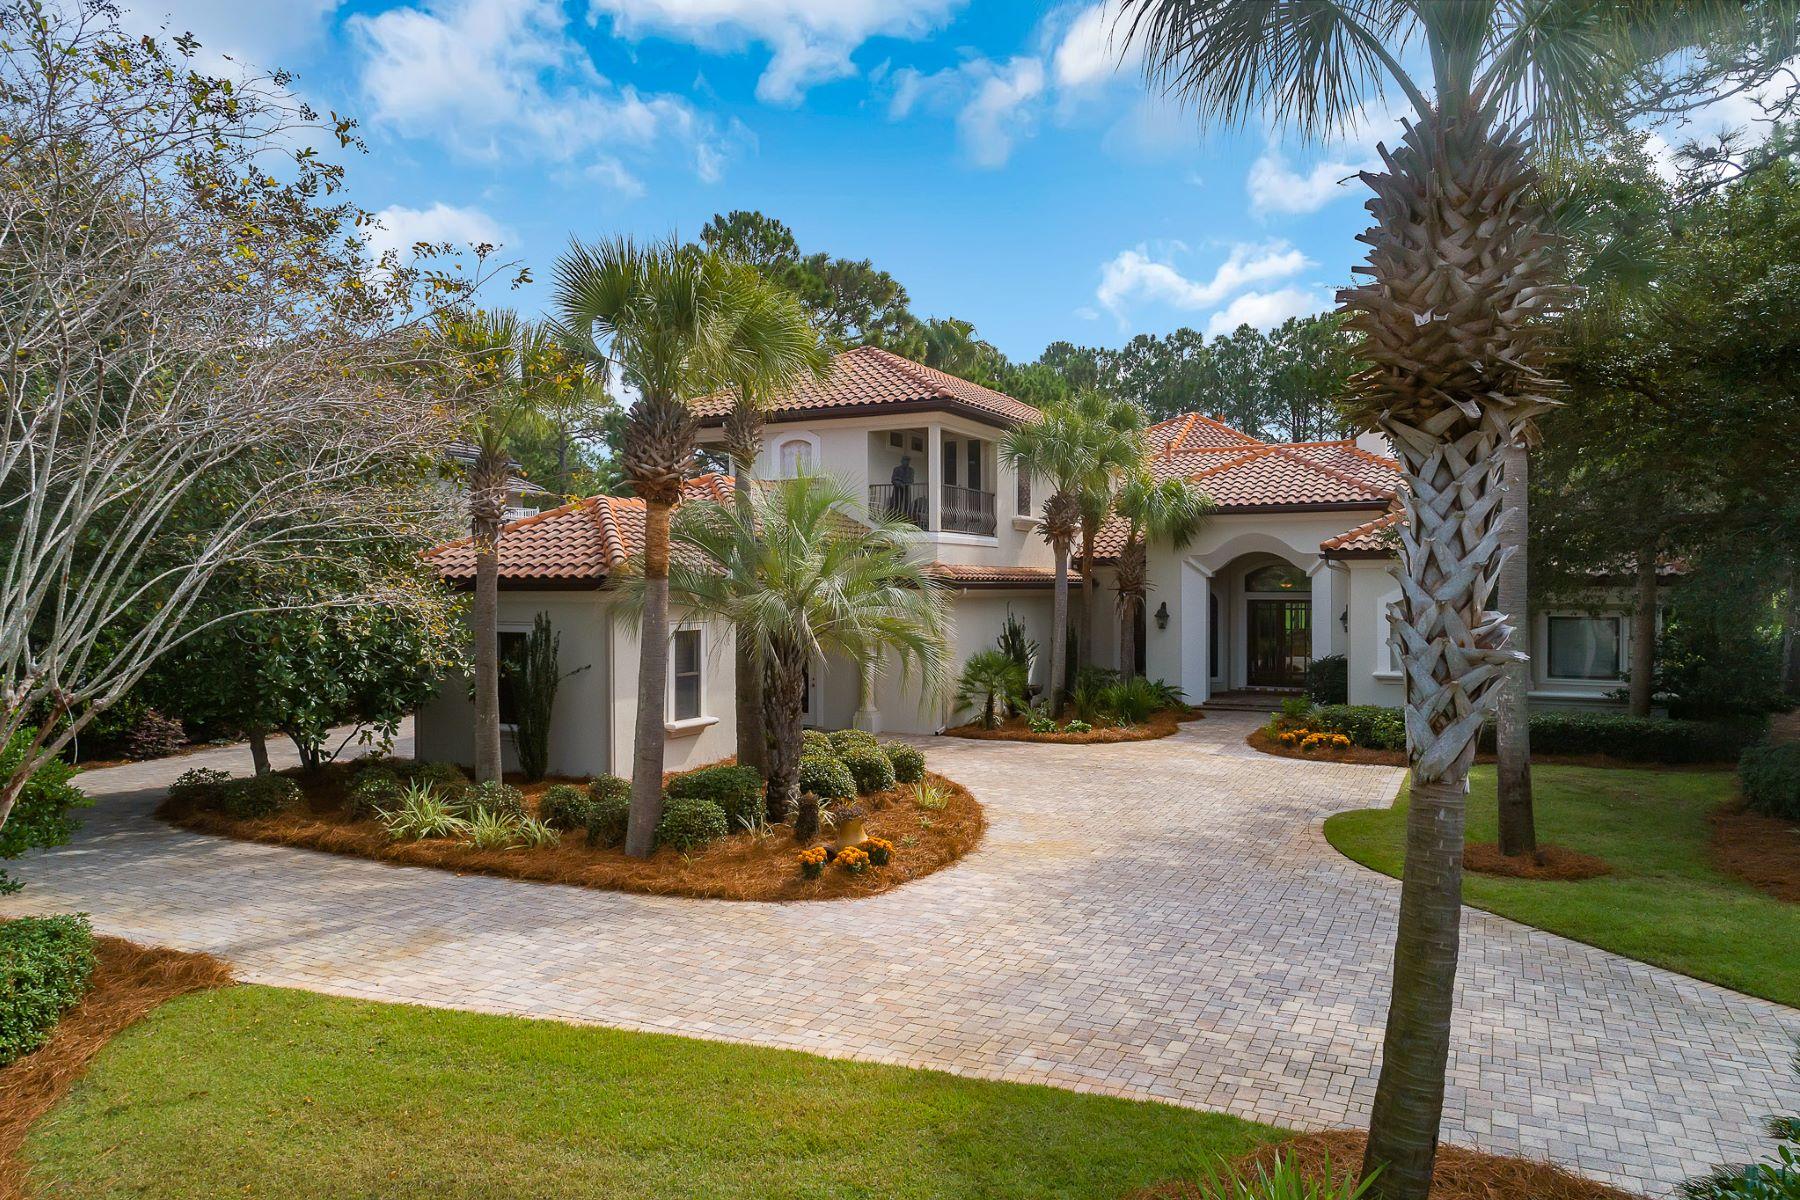 Single Family Homes for Sale at Elegantly Custom Designed Home in Burnt Pine 3277 Burnt Pine Circle Miramar Beach, Florida 32550 United States